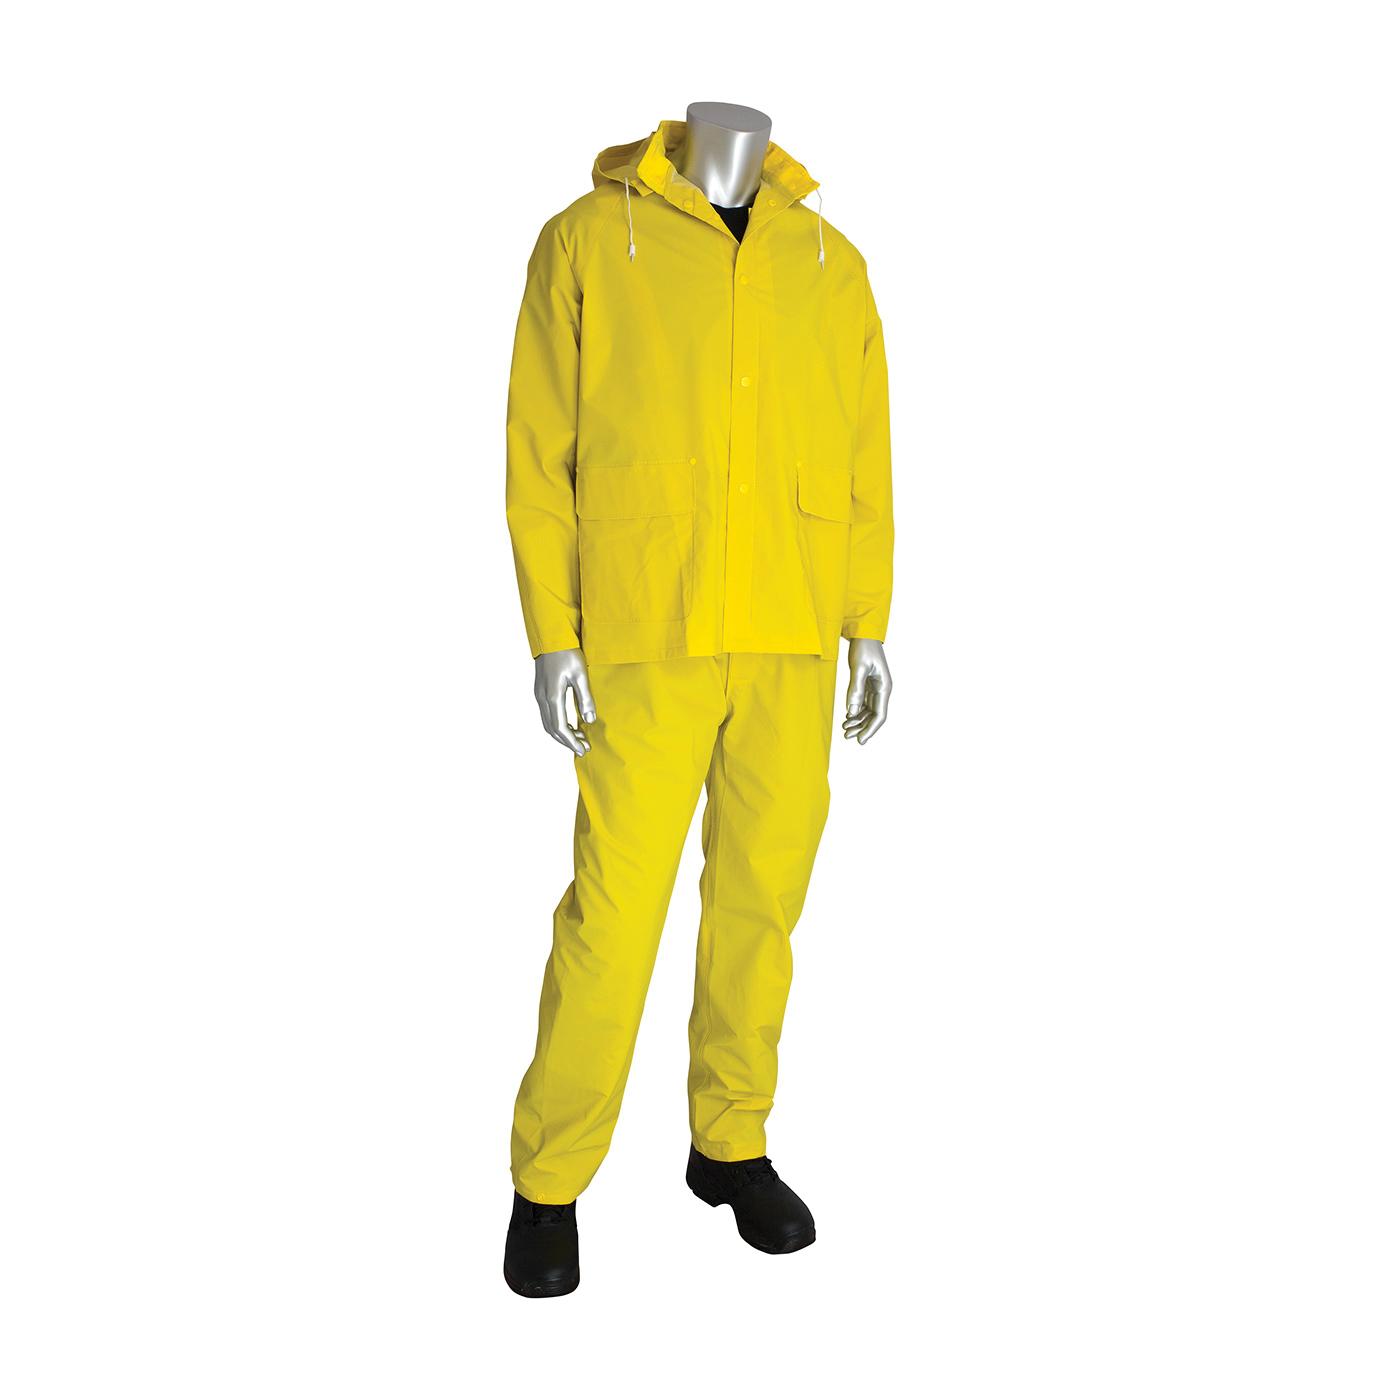 PIP® 201-370X1 3-Piece Premium Rainsuit, XL, Hi-Viz Lime Yellow, Polyester/Corduroy/PVC, 50 in Waist, 31 in L Inseam, Detachable Hood